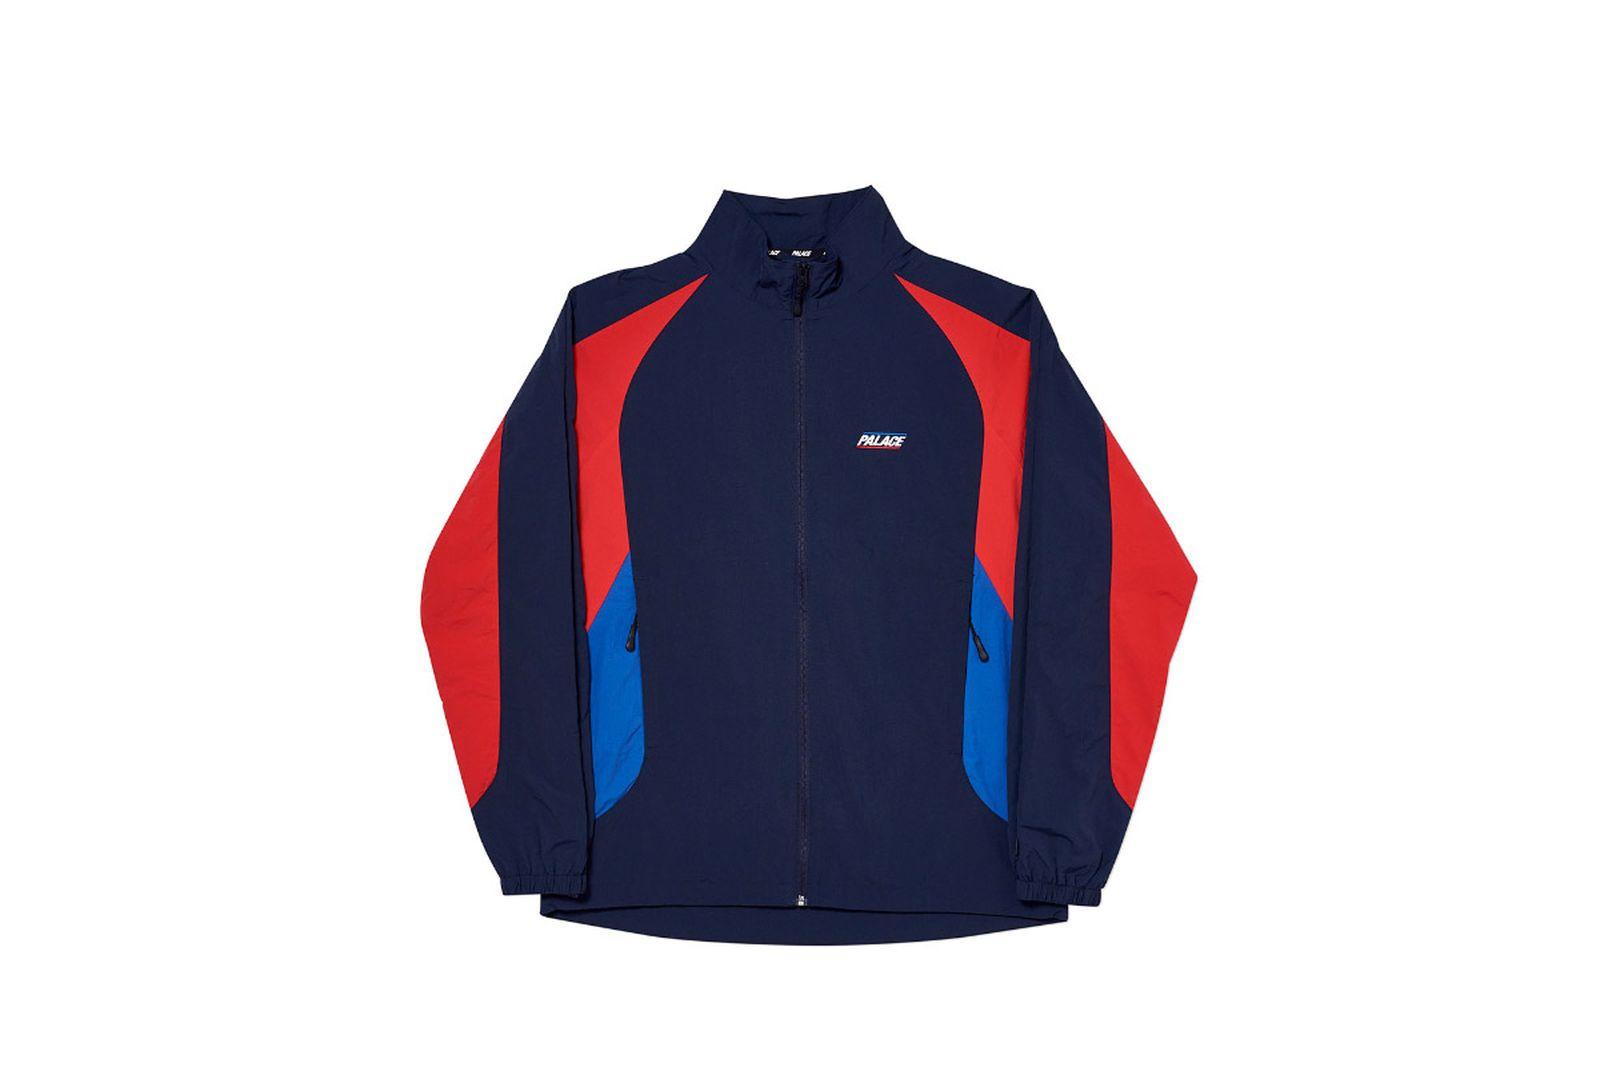 Palace 2019 Autumn Jacket revealer shell navy